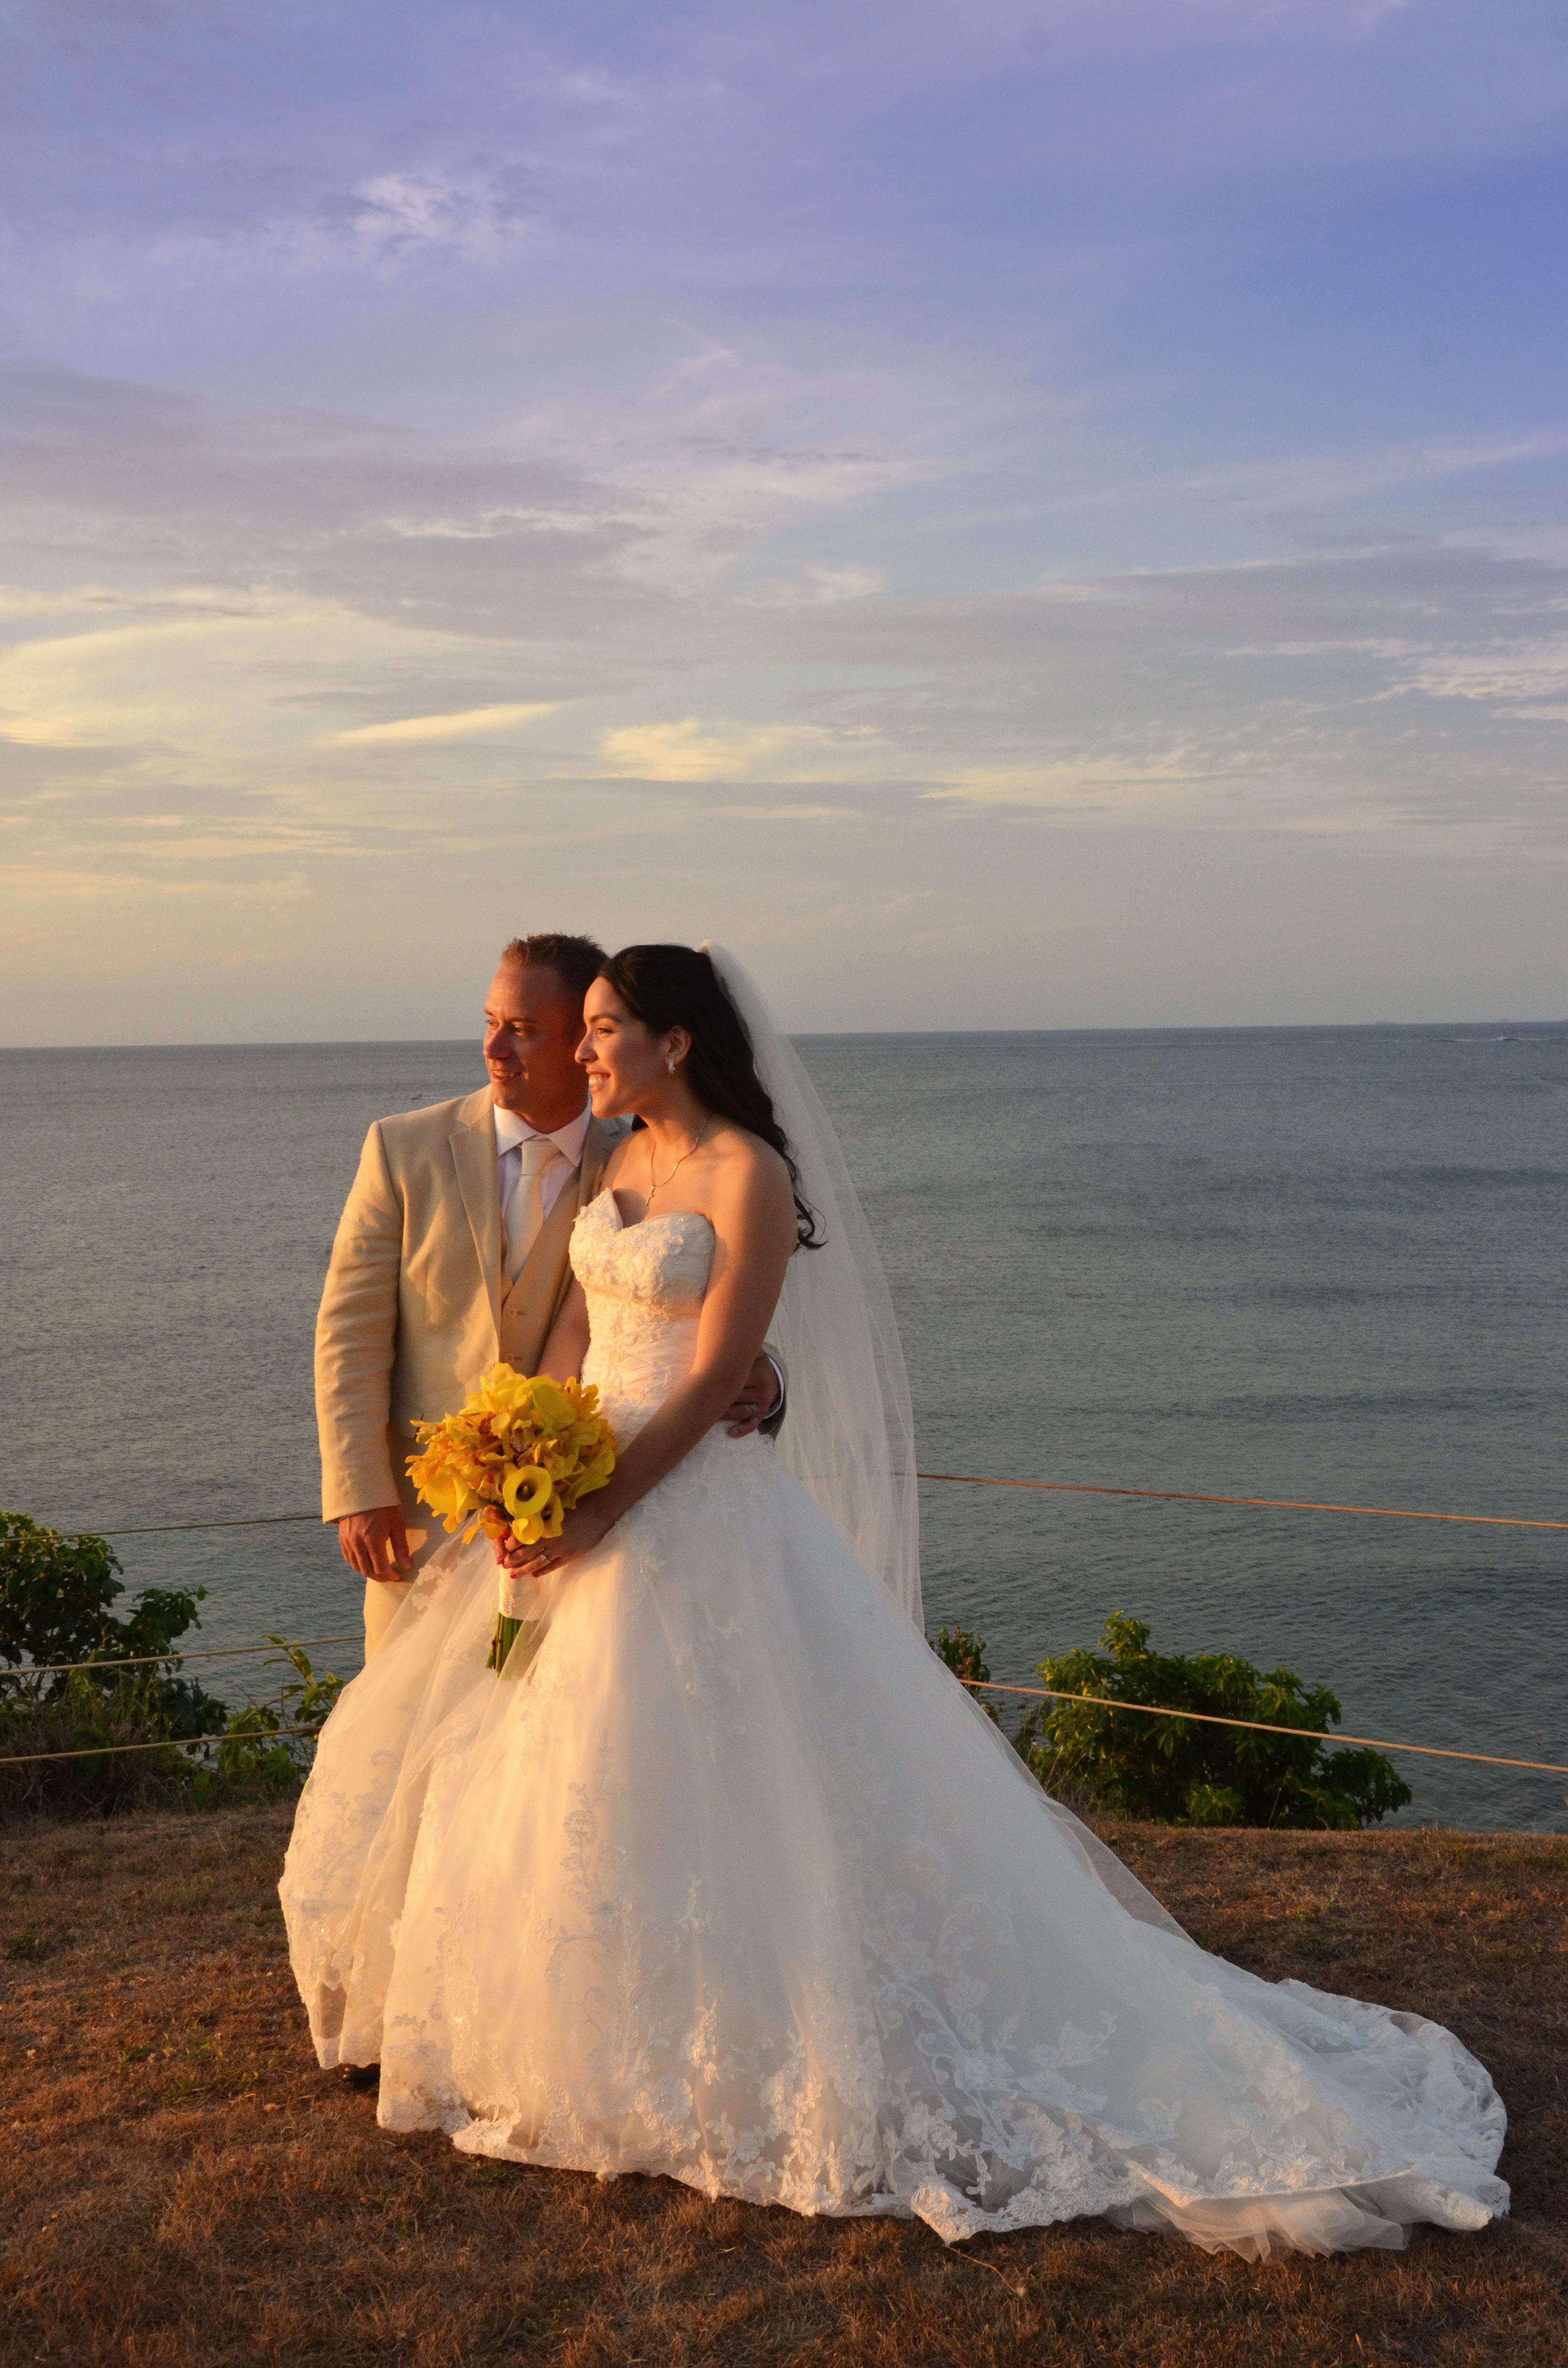 A beautiful snapshot of newlyweds, Stephanie and Jared